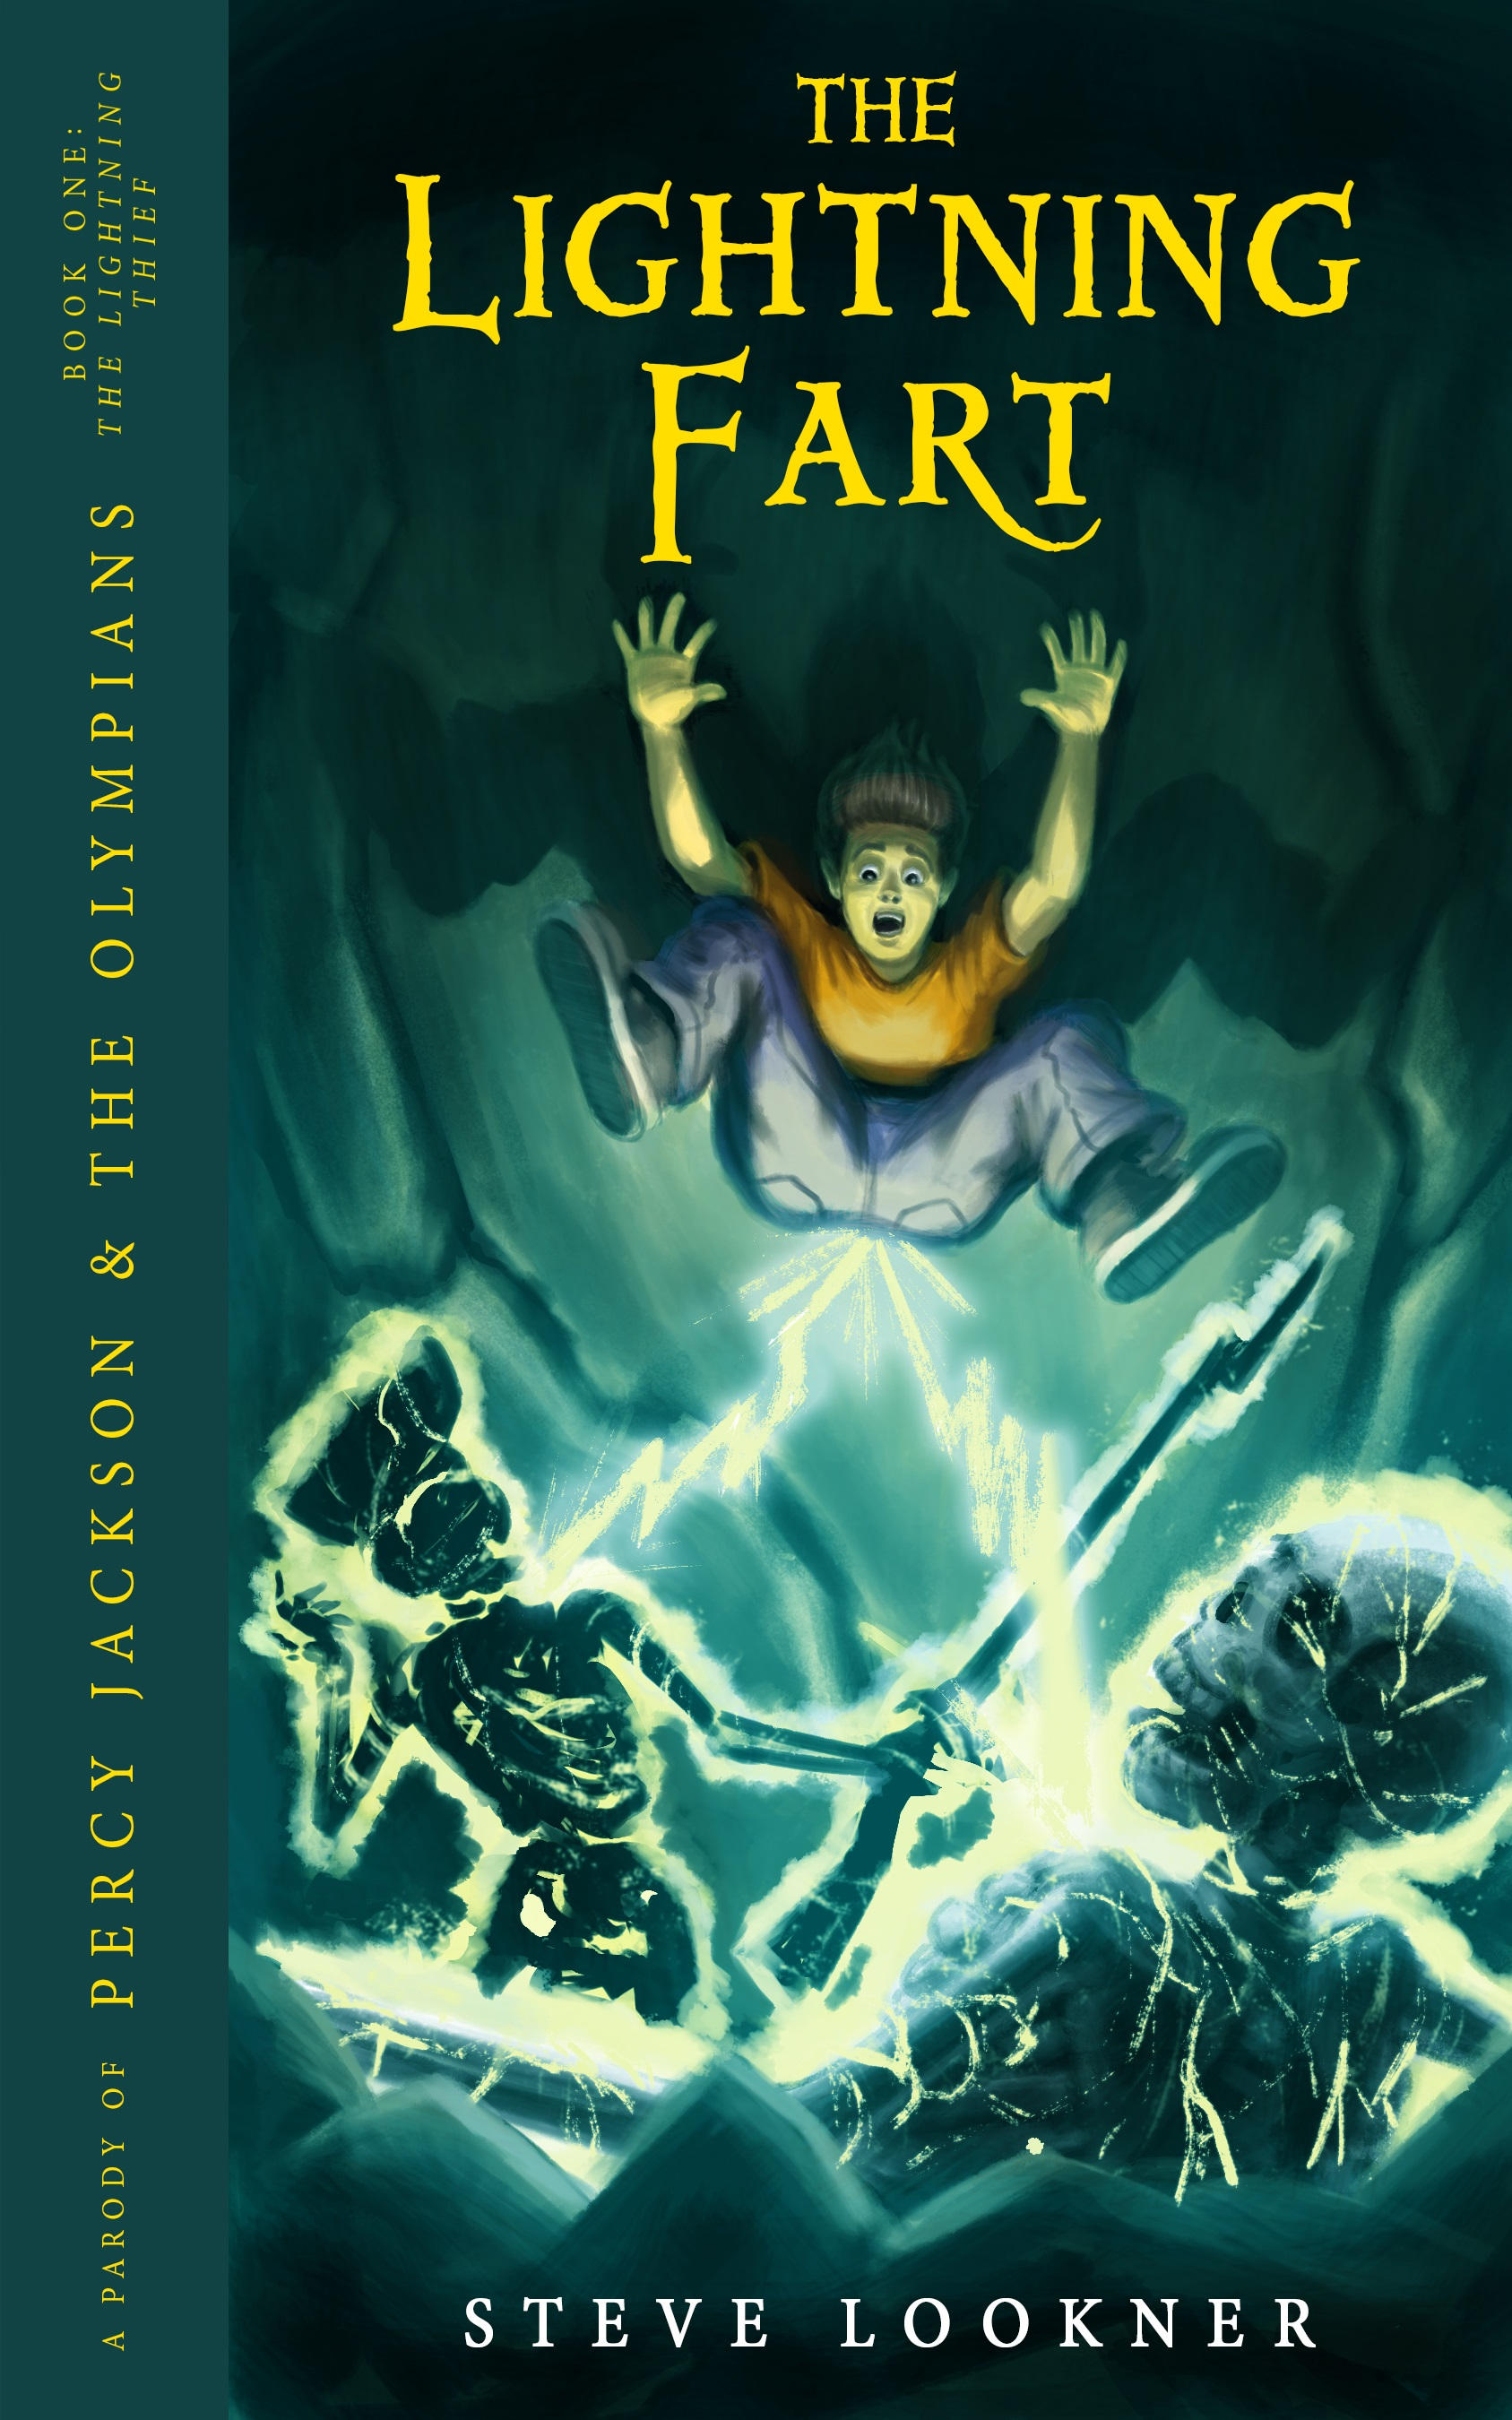 The Lightning Fart: A Parody of The Lightning Thief